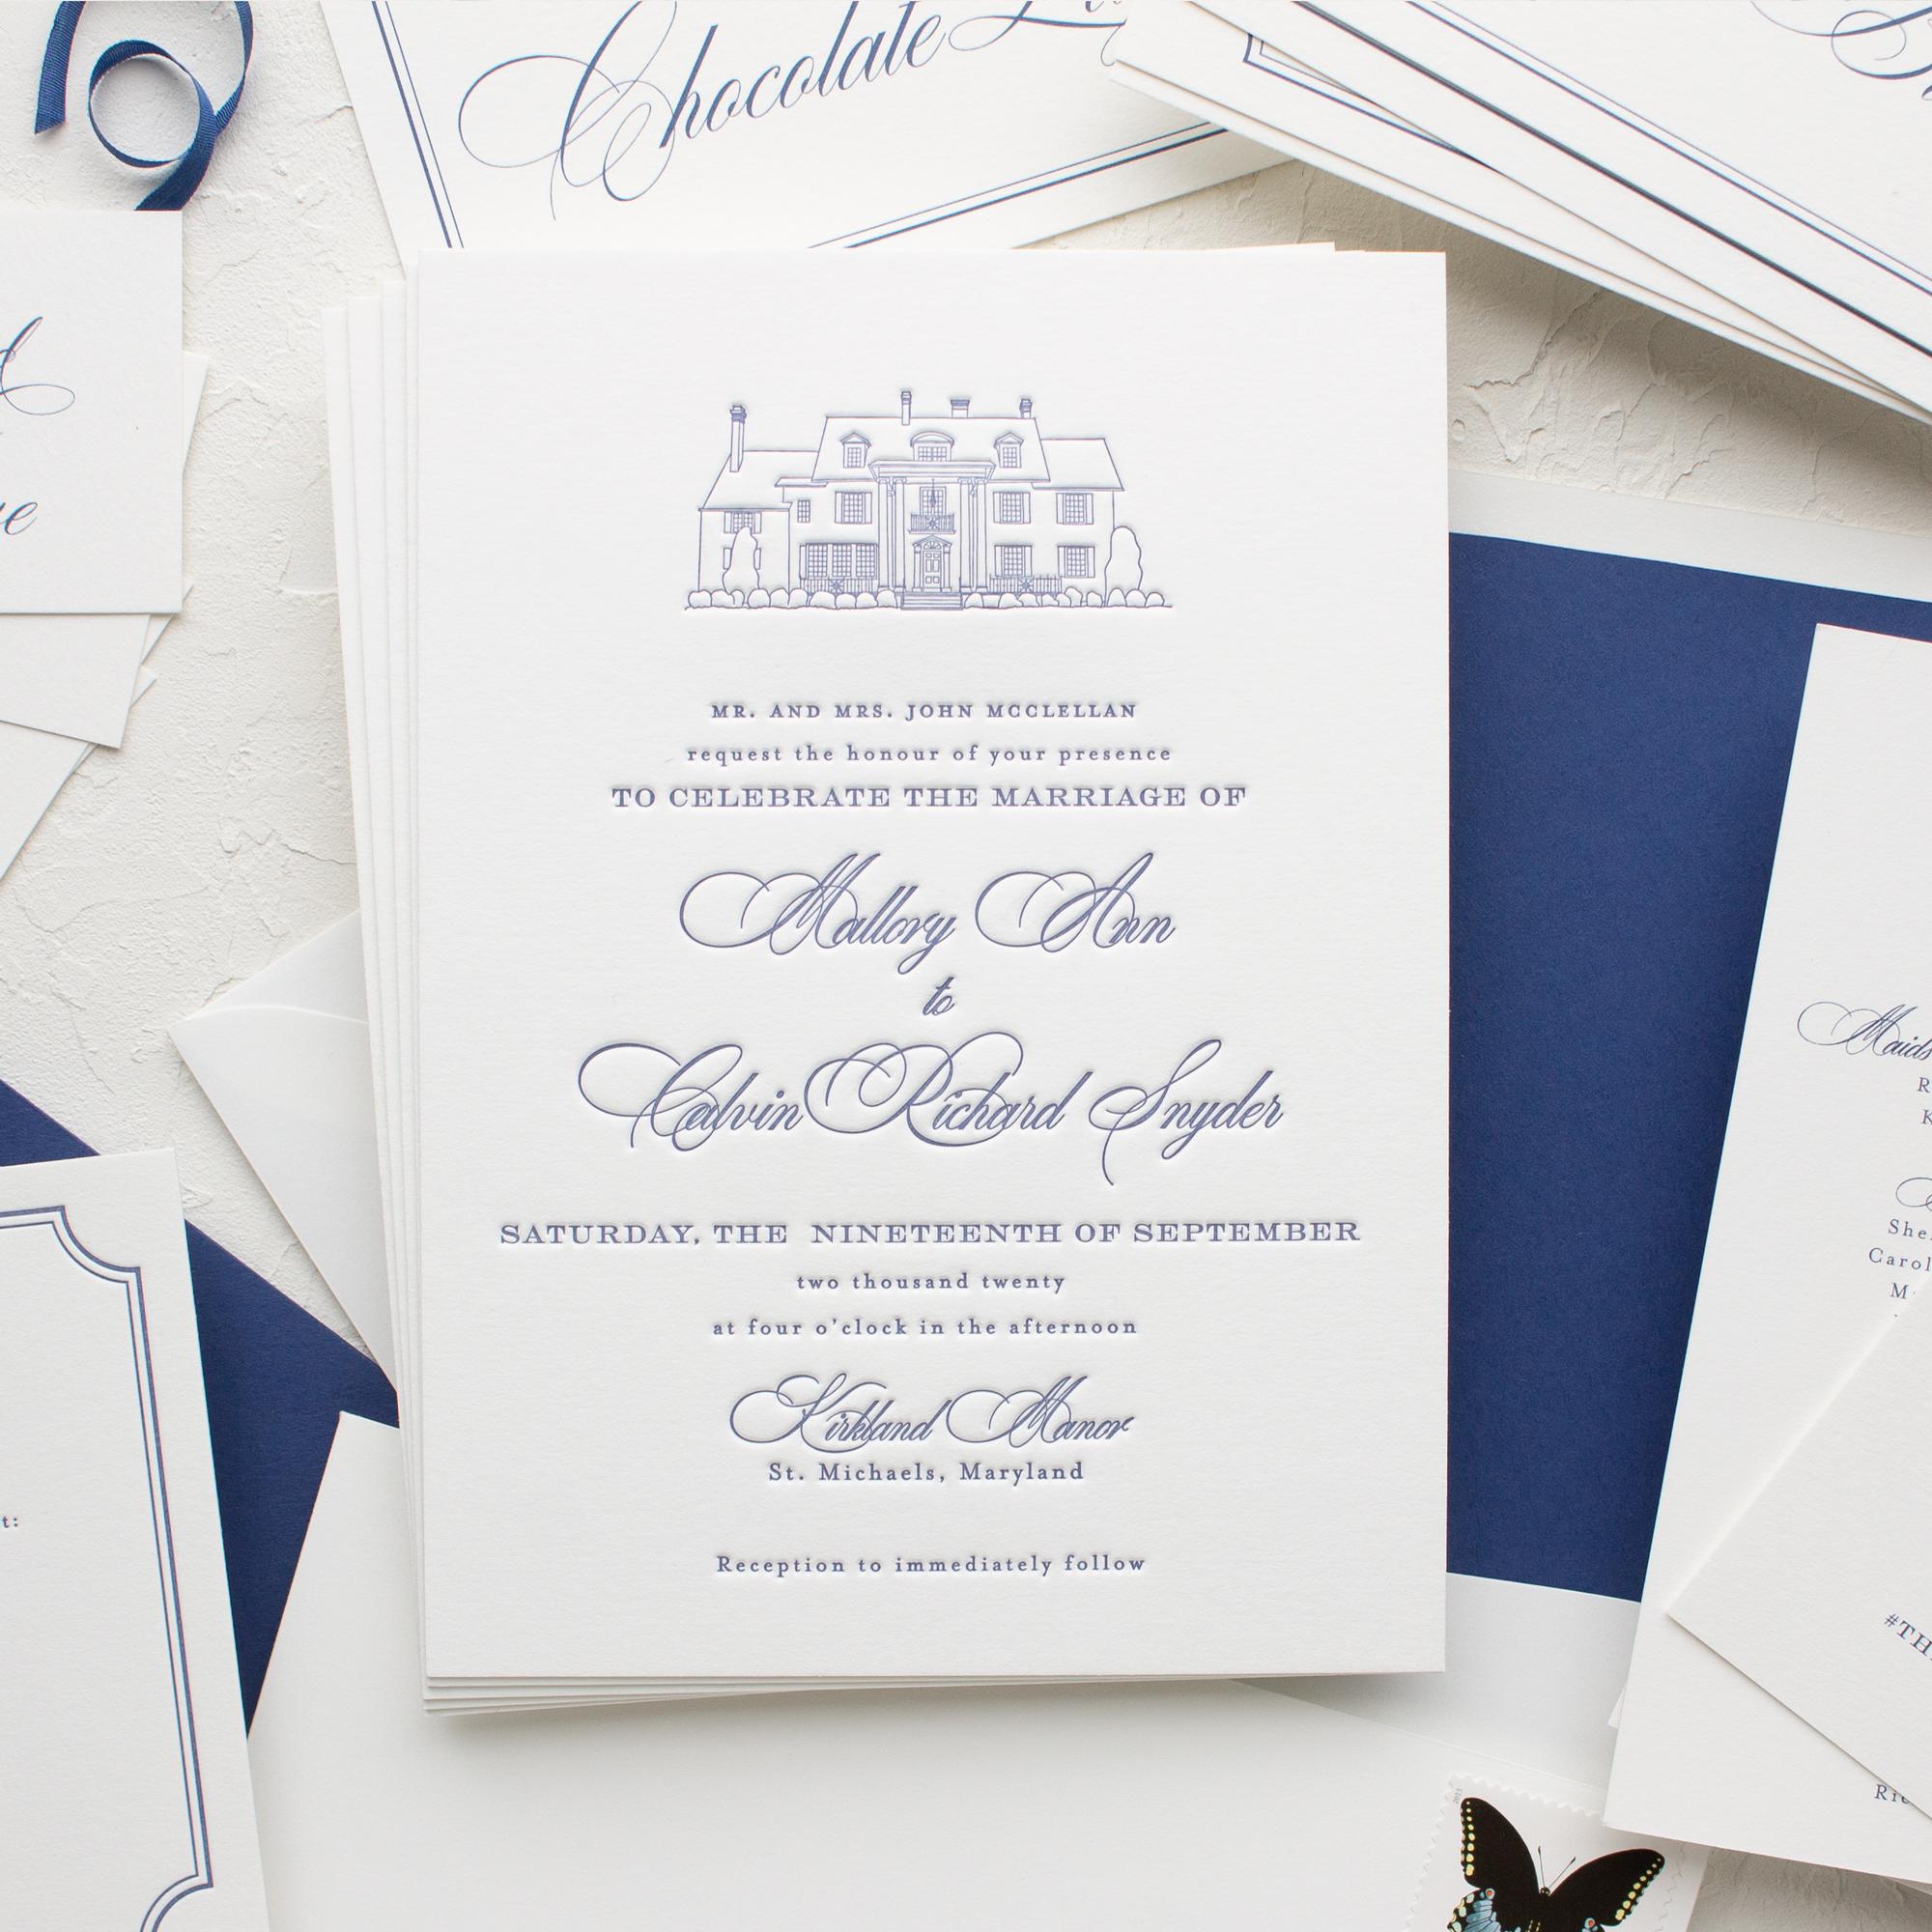 Maryland wedding custom invitations